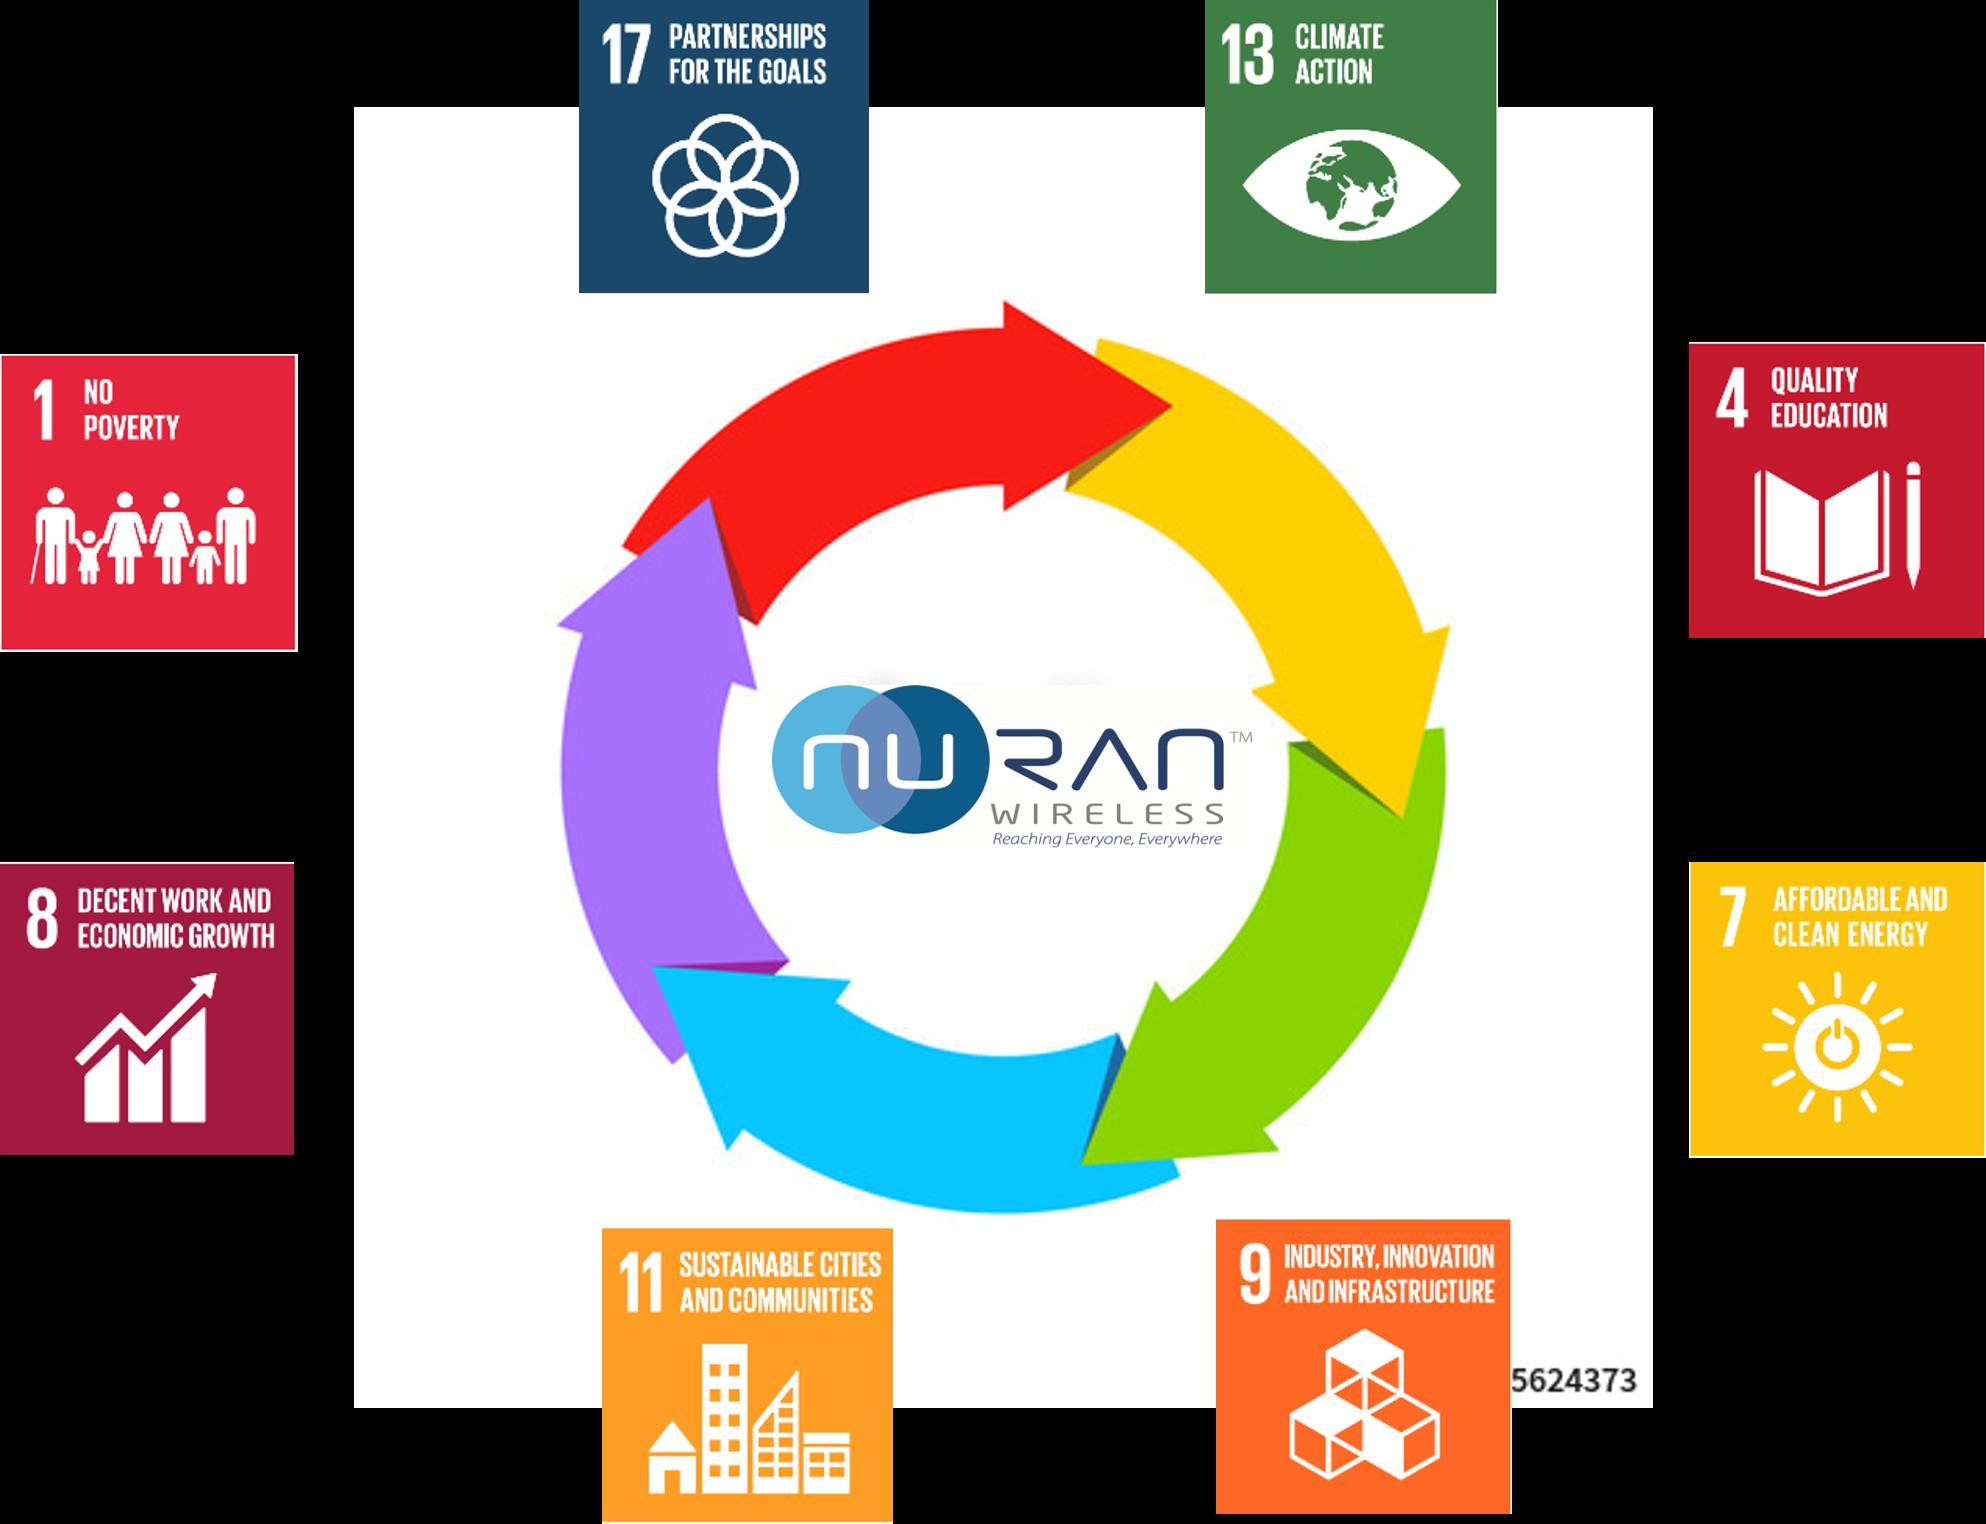 NuRAN impact on SDG | SDG | NuRAN Wireless - Mobile and Wireless Network Solutions